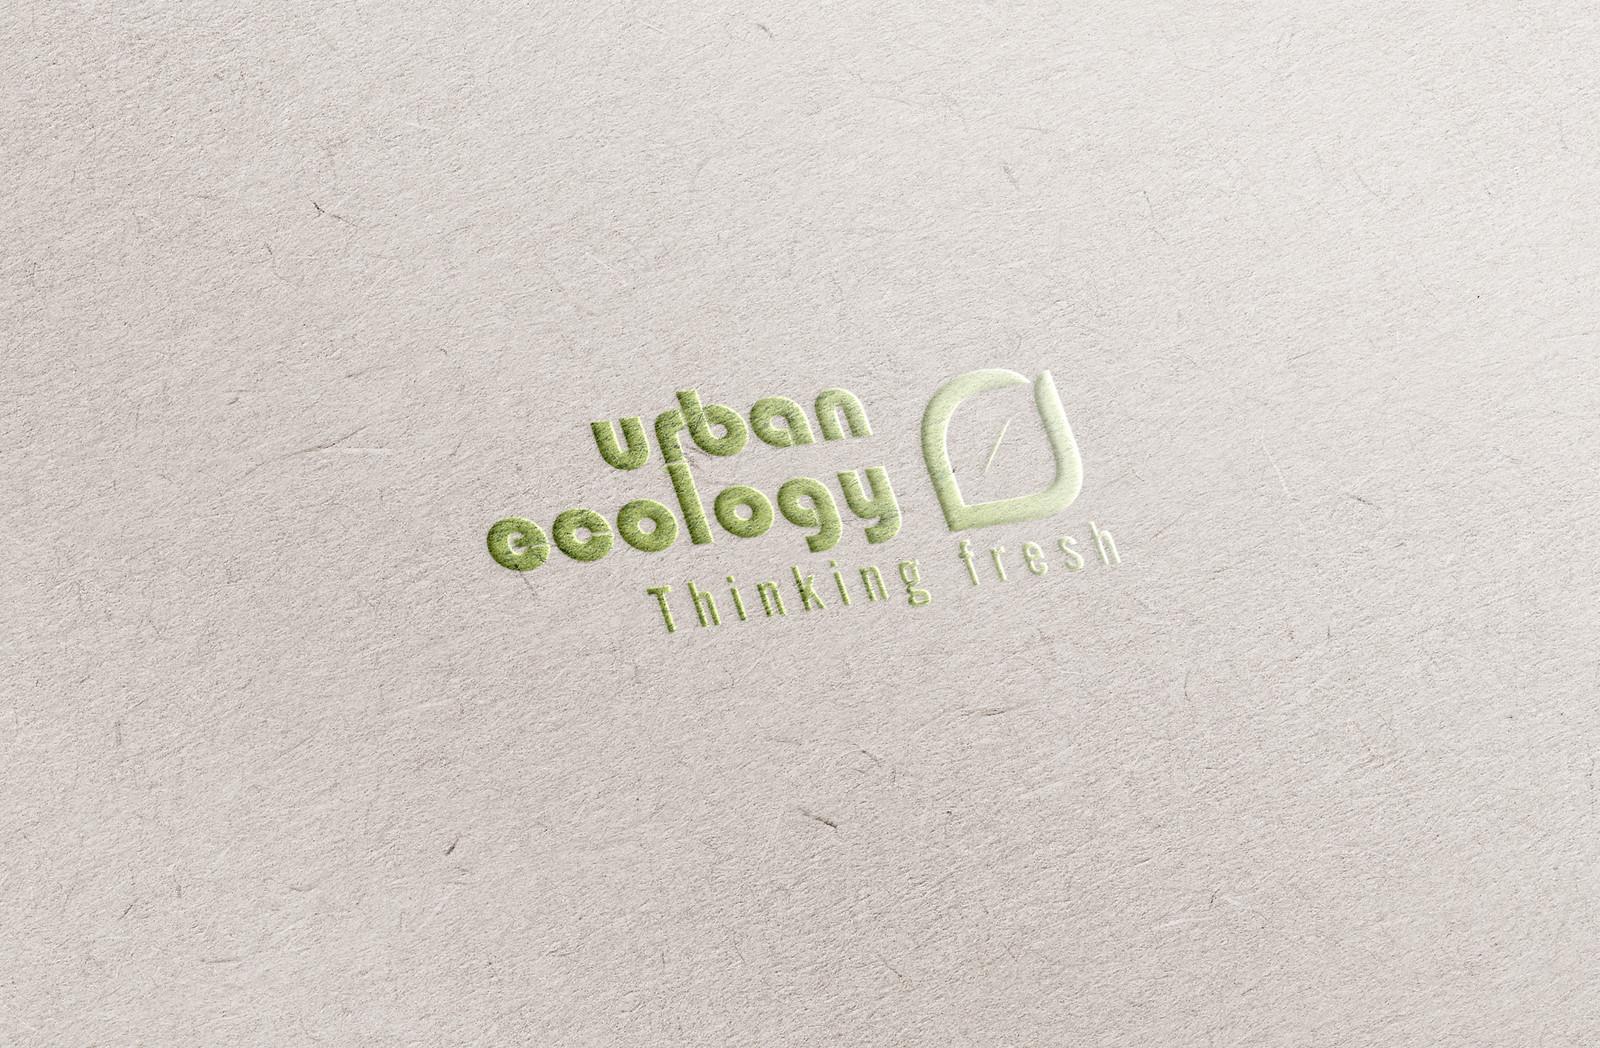 Urban Ecology - Corporate image